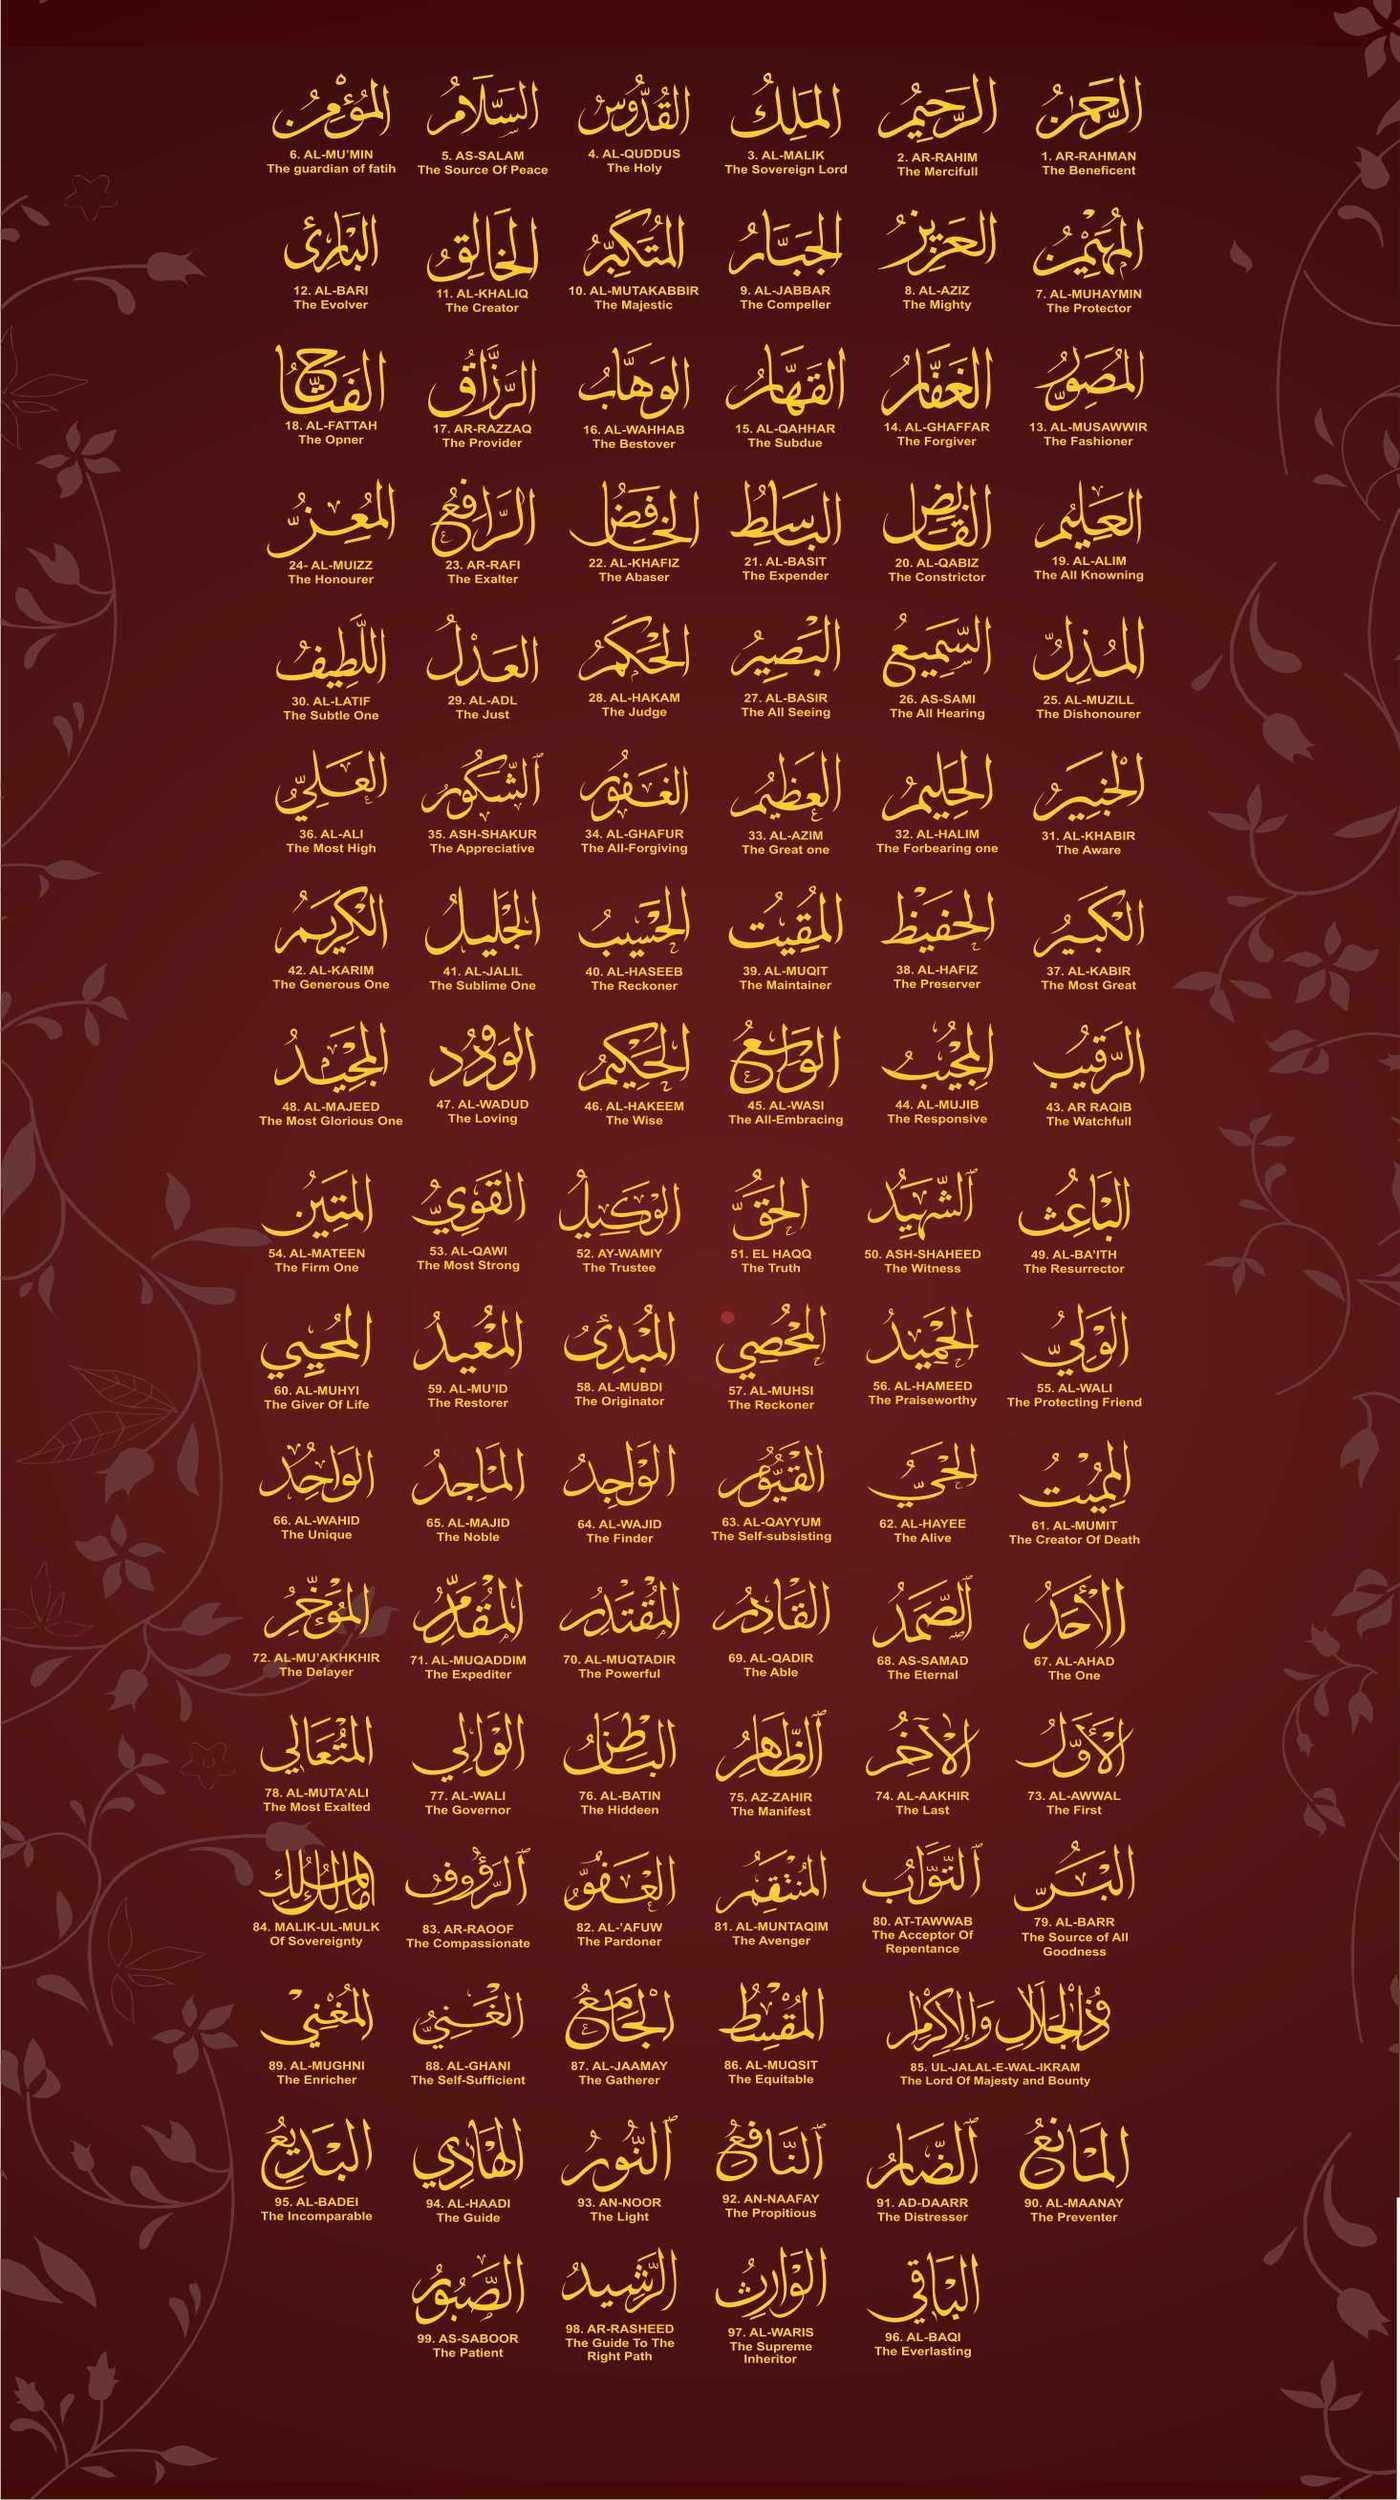 99 Names Of Allah Beautiful Names Of Allah Kaligrafi Allah Islamic Wall Art